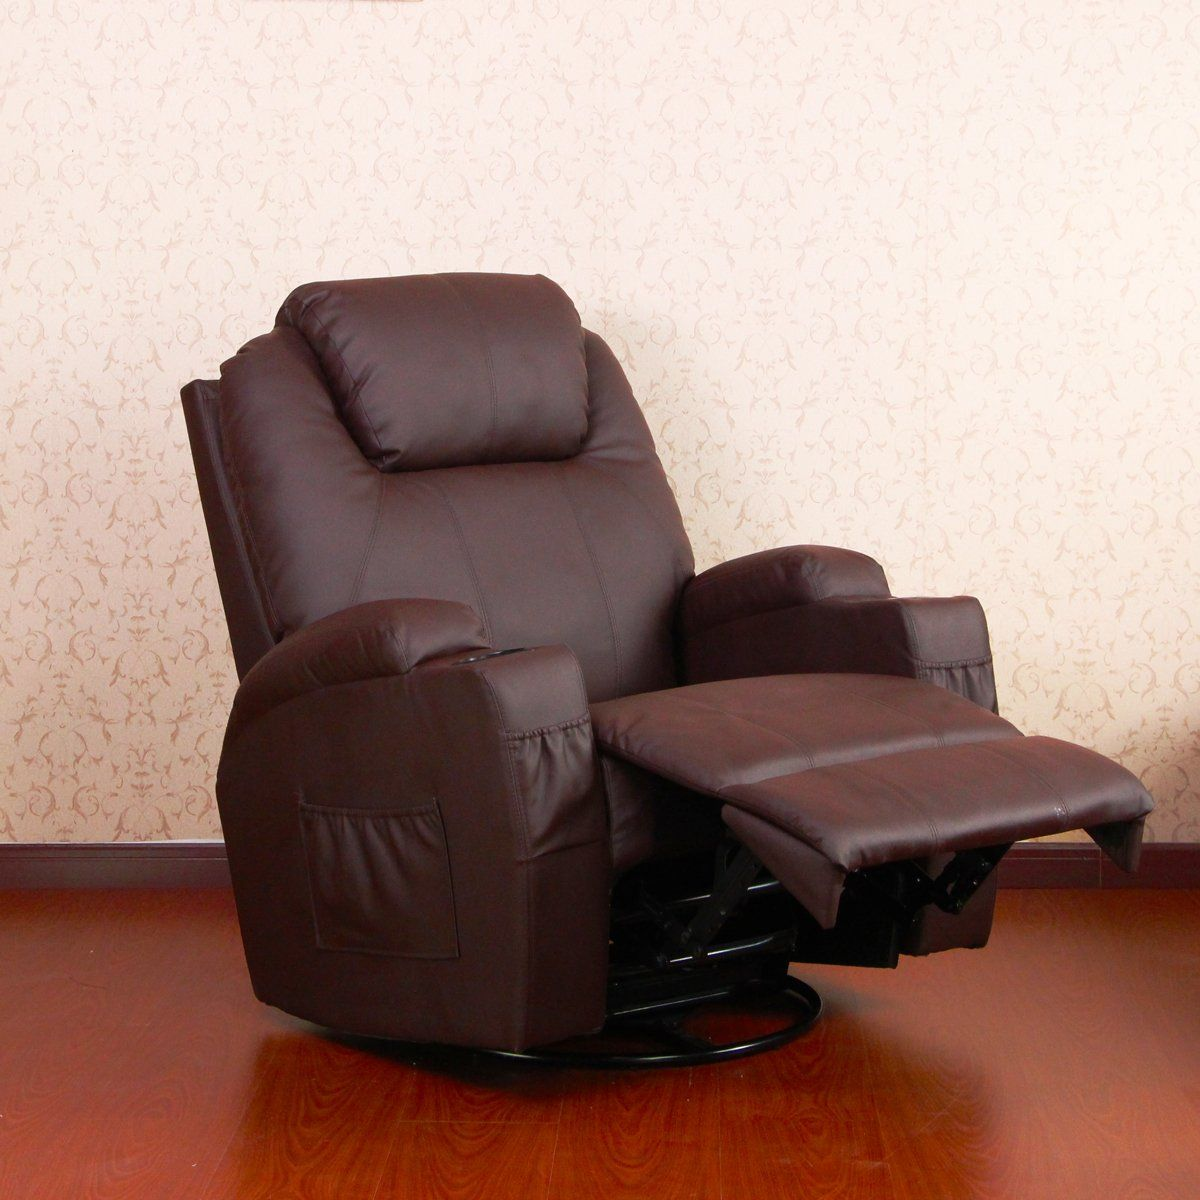 UMAX Heated Massage Recliner Chair PU Leather Ergonomic